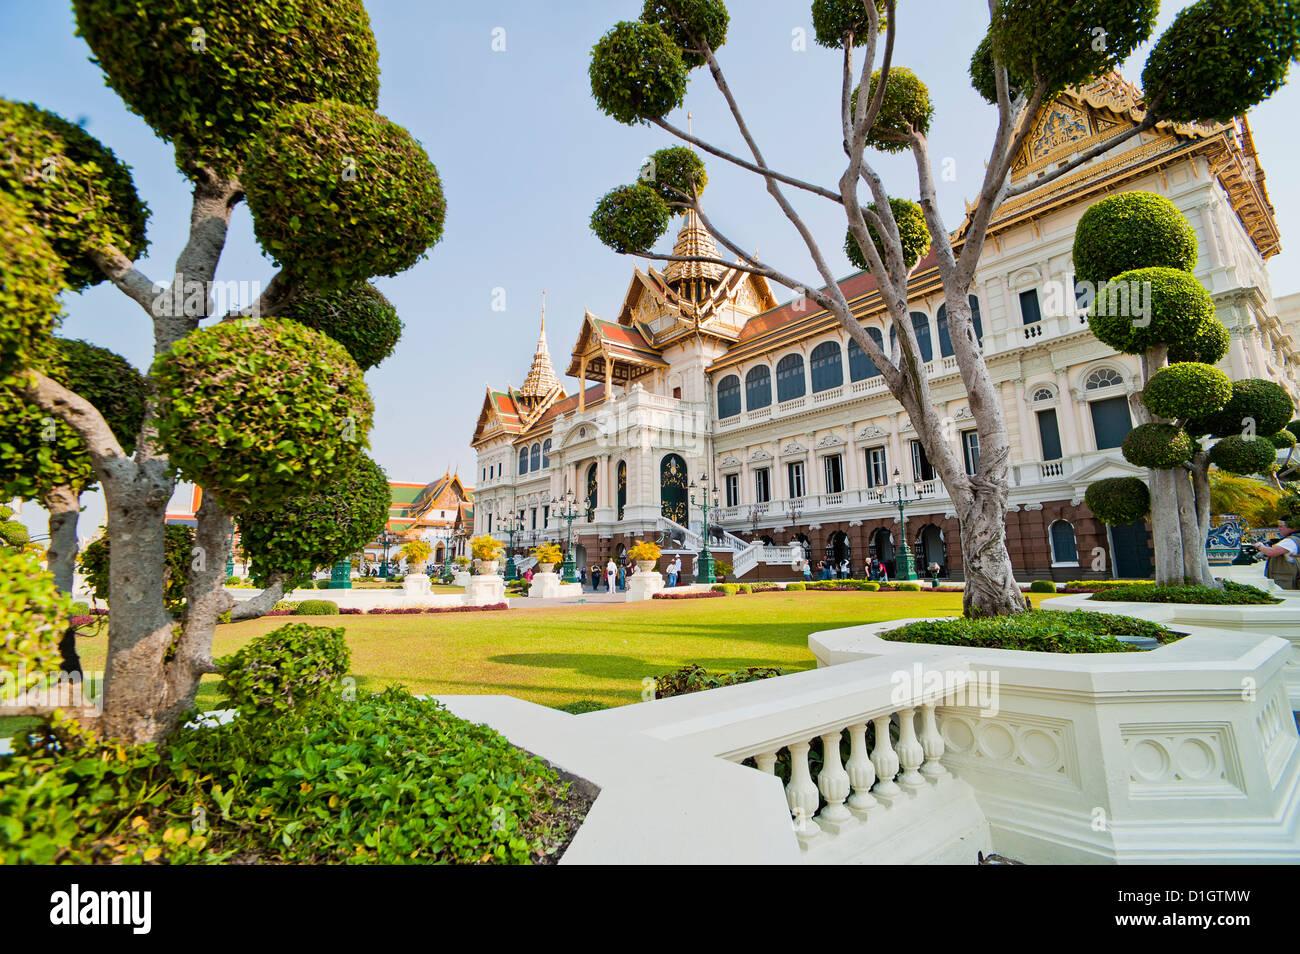 Chakri Maha Prasat Hall, Grand Palace, Bangkok, Thaïlande, Asie du Sud-Est, Asie Photo Stock